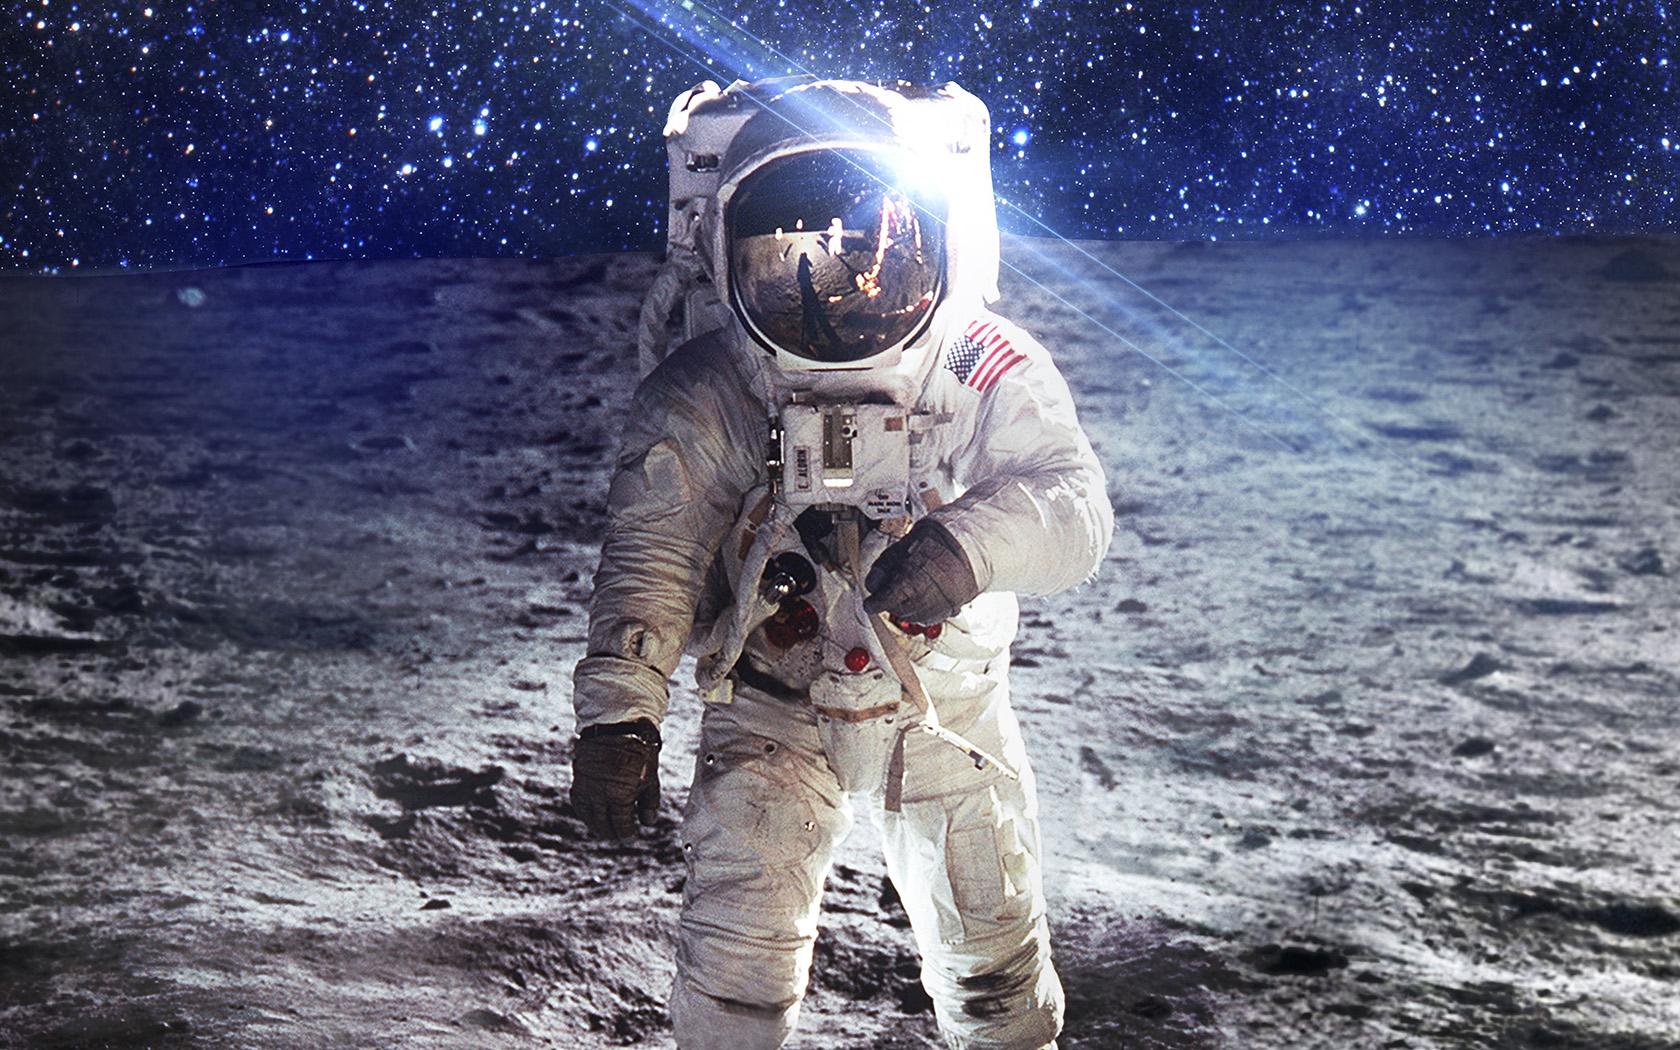 Desktop Wallpaper Fall Images Ao97 Astronaut Space Art Moon Dark Papers Co